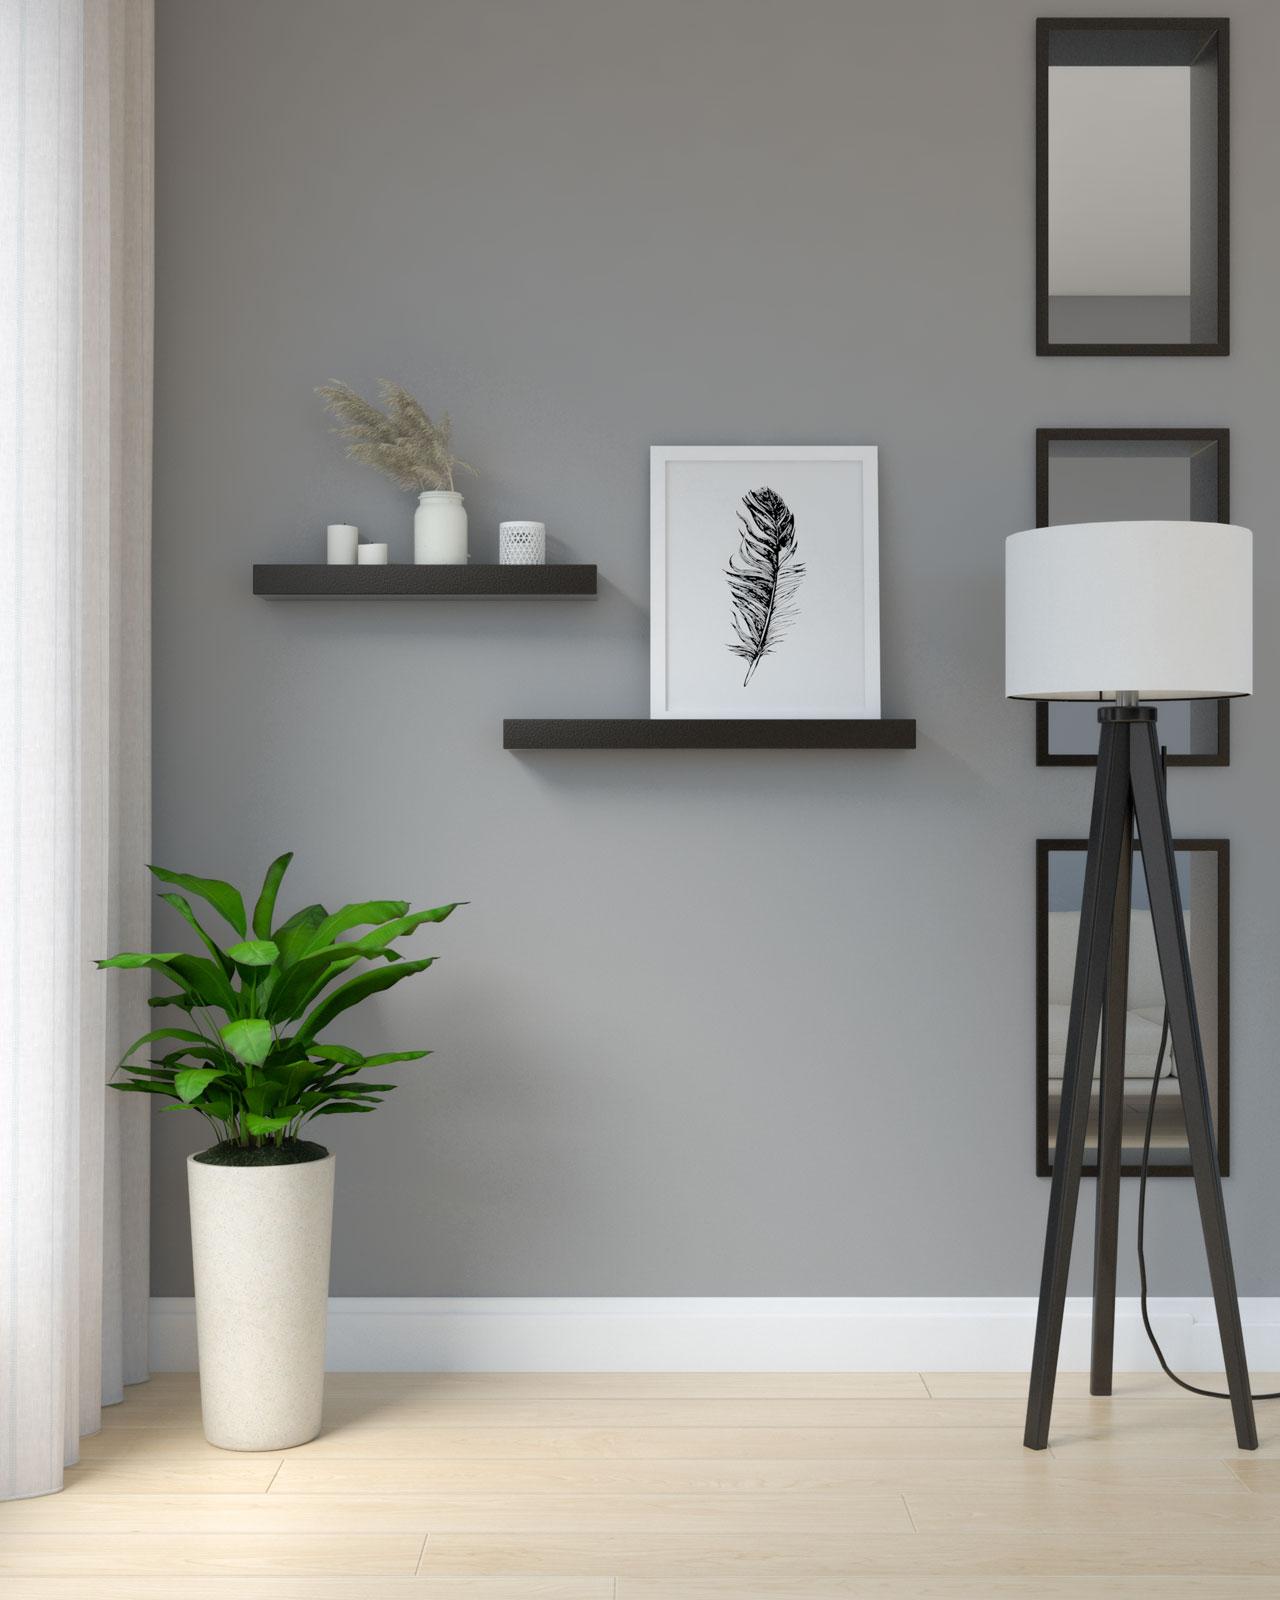 Black shelves on gray wall